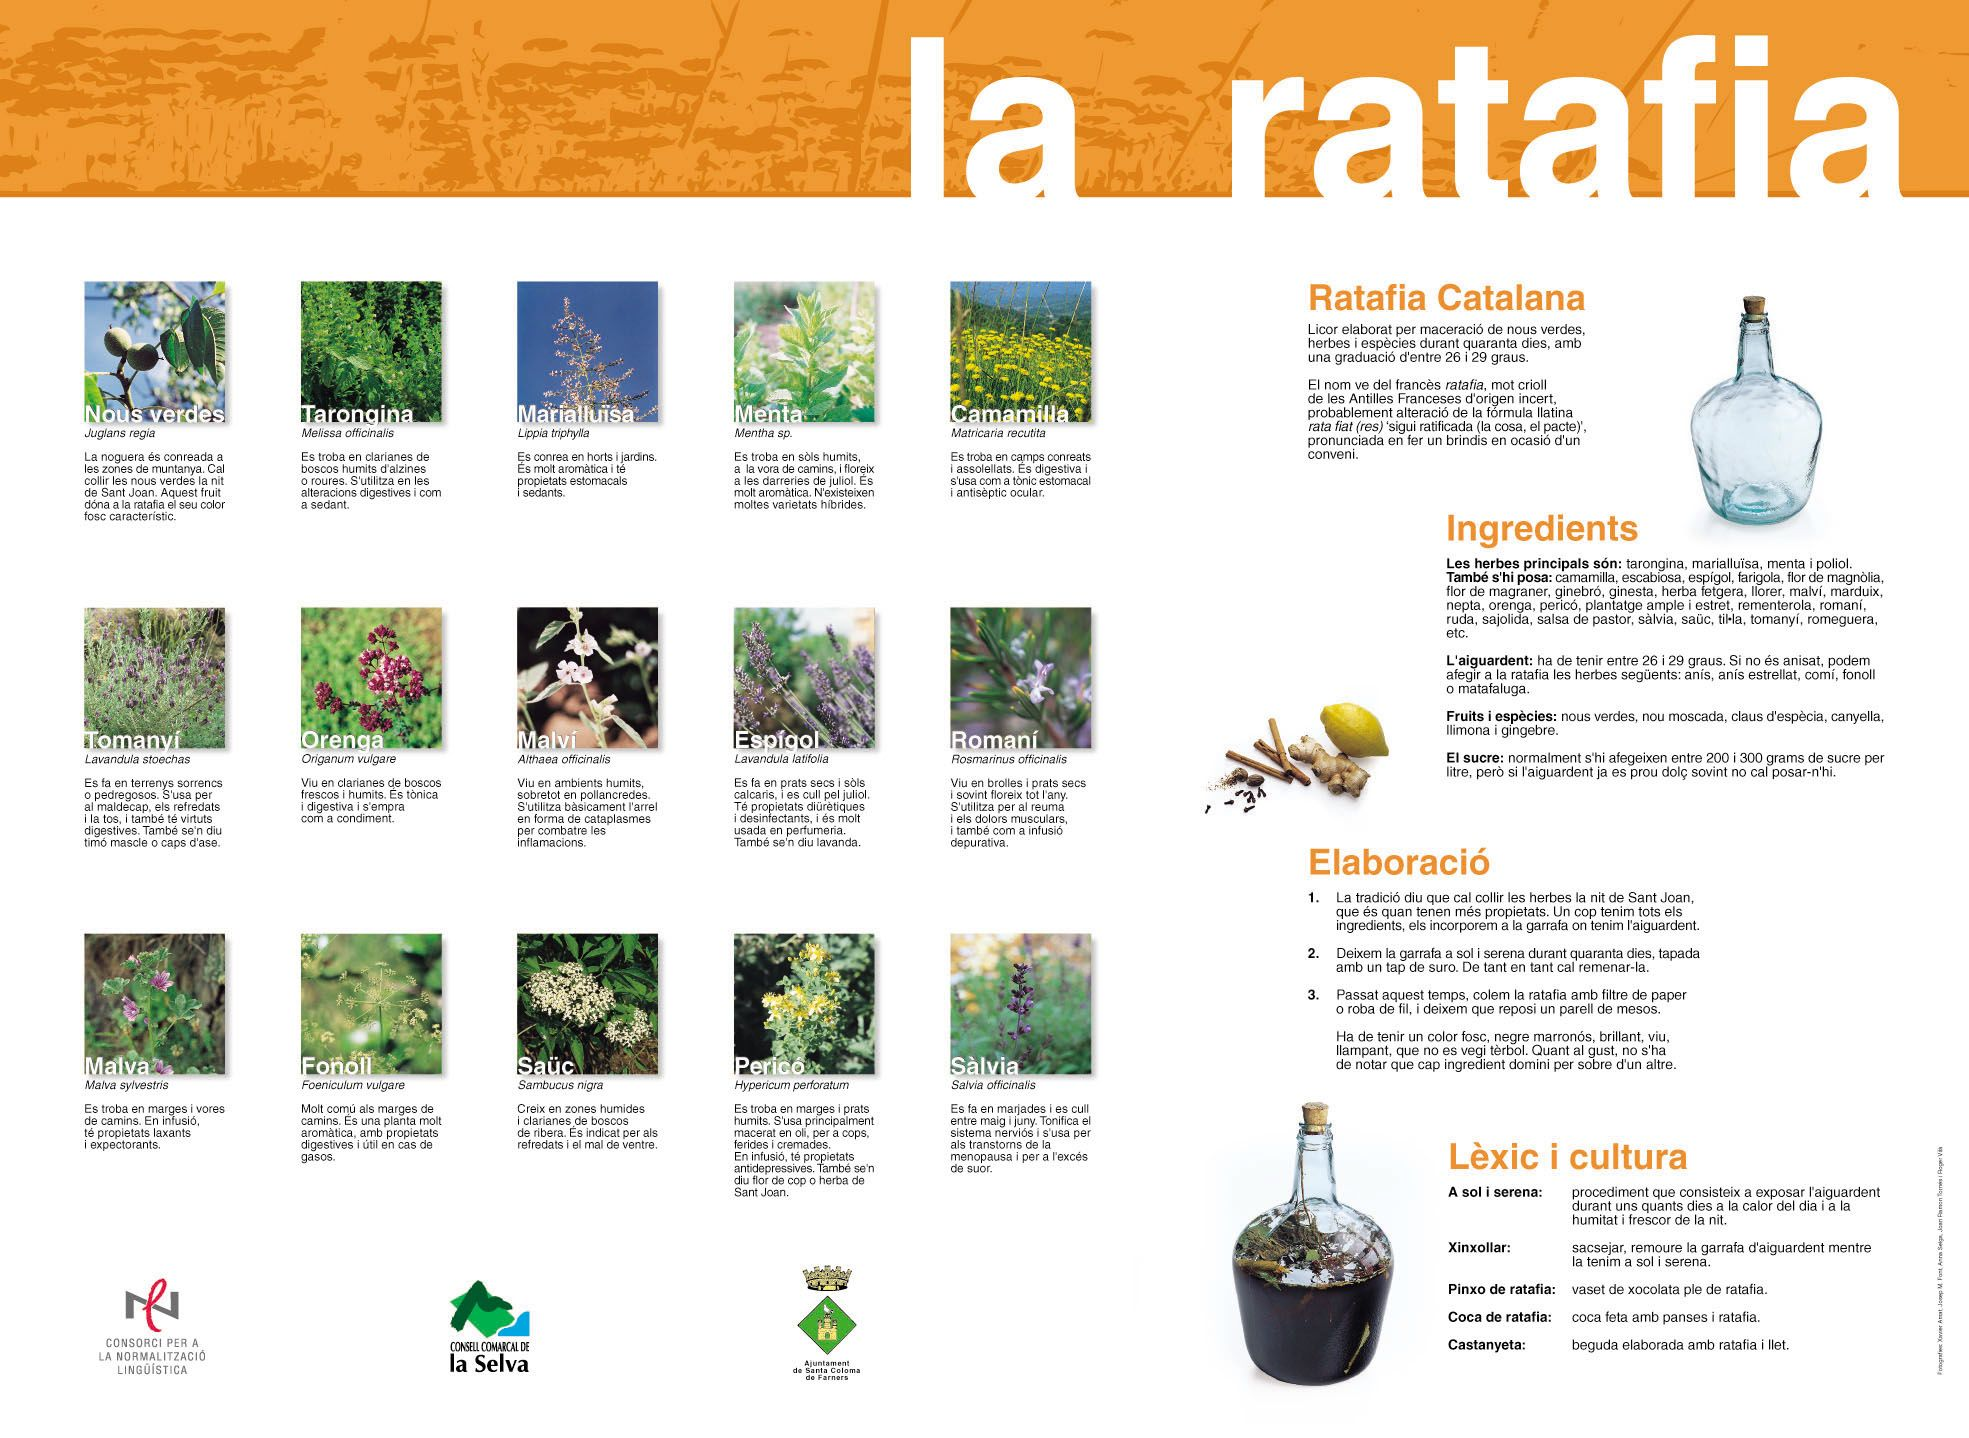 280 Catalan Ratafia Ideas Las Marias Catalan Recipes Bottle Design Packaging